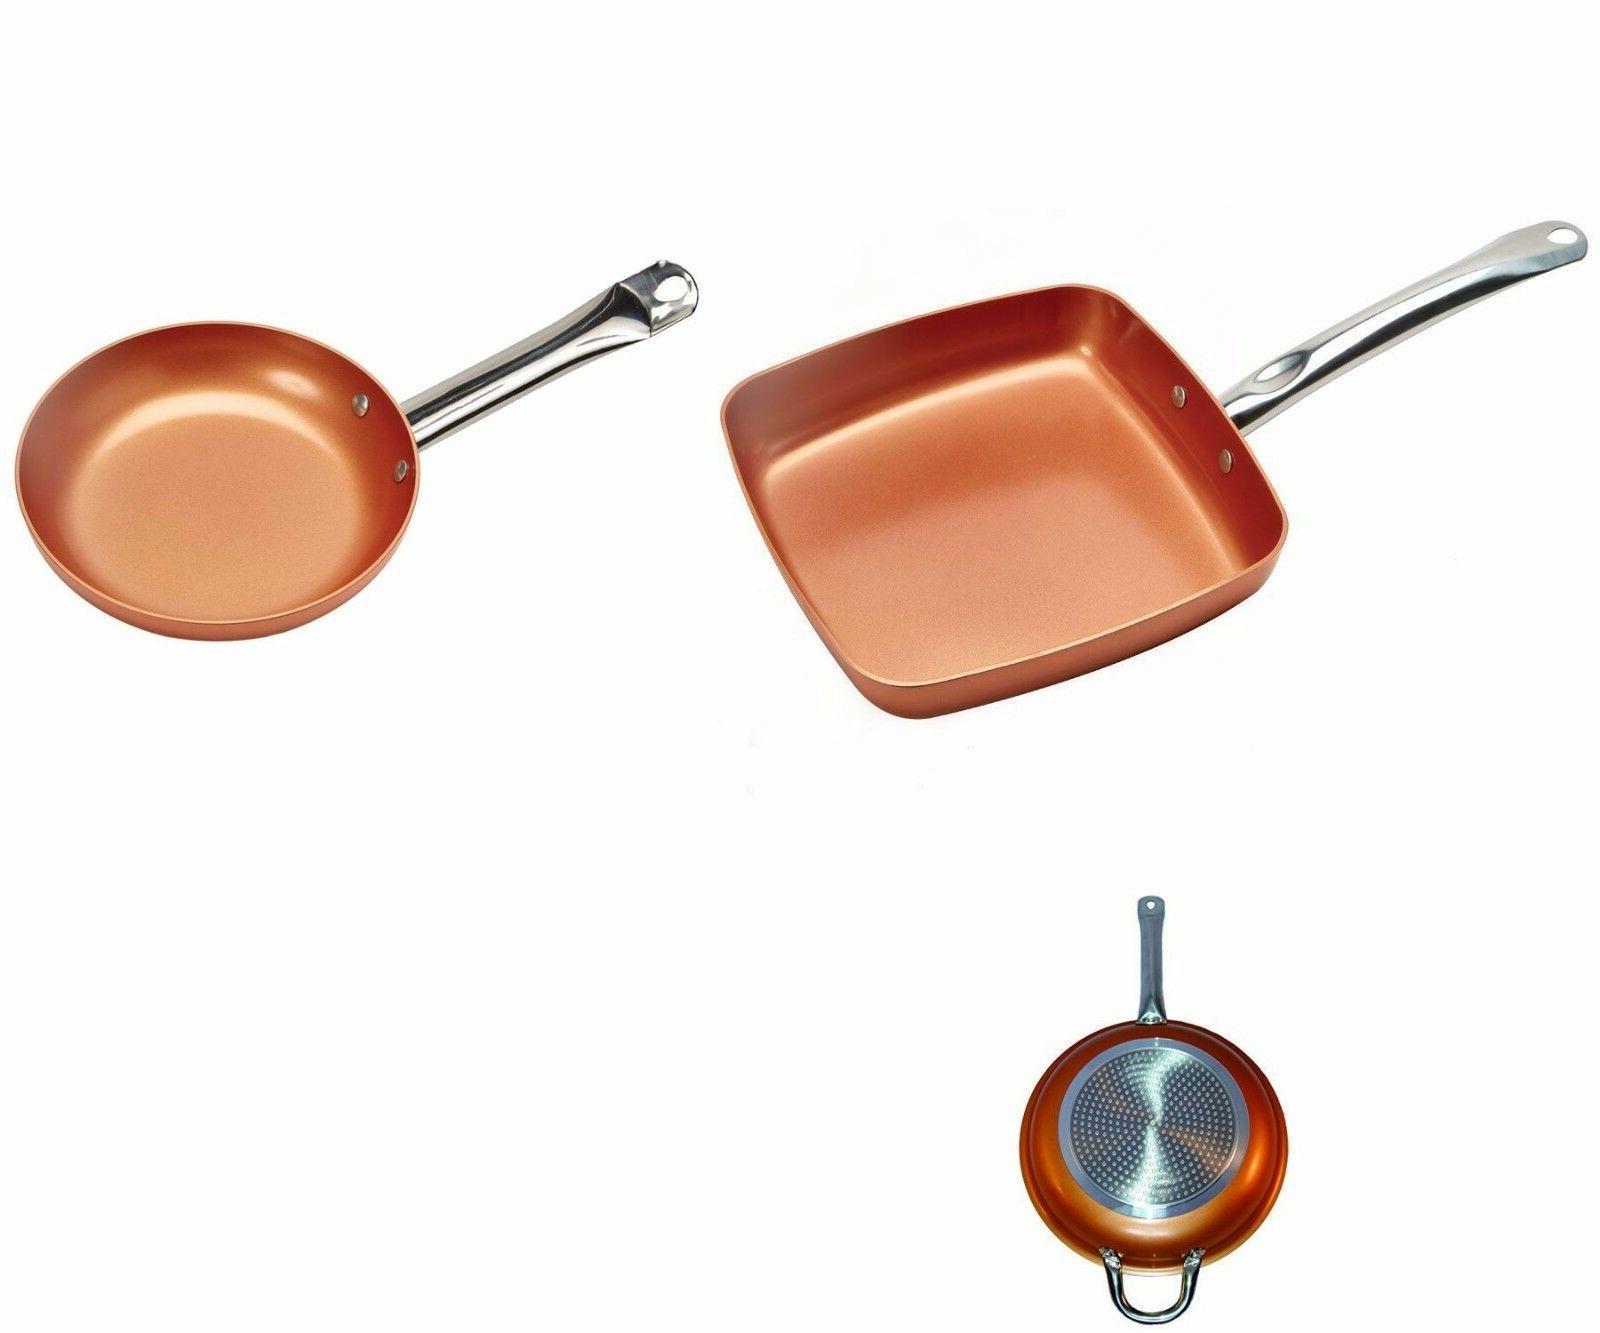 Copper Frying Ceramic NonStick Fry Chef